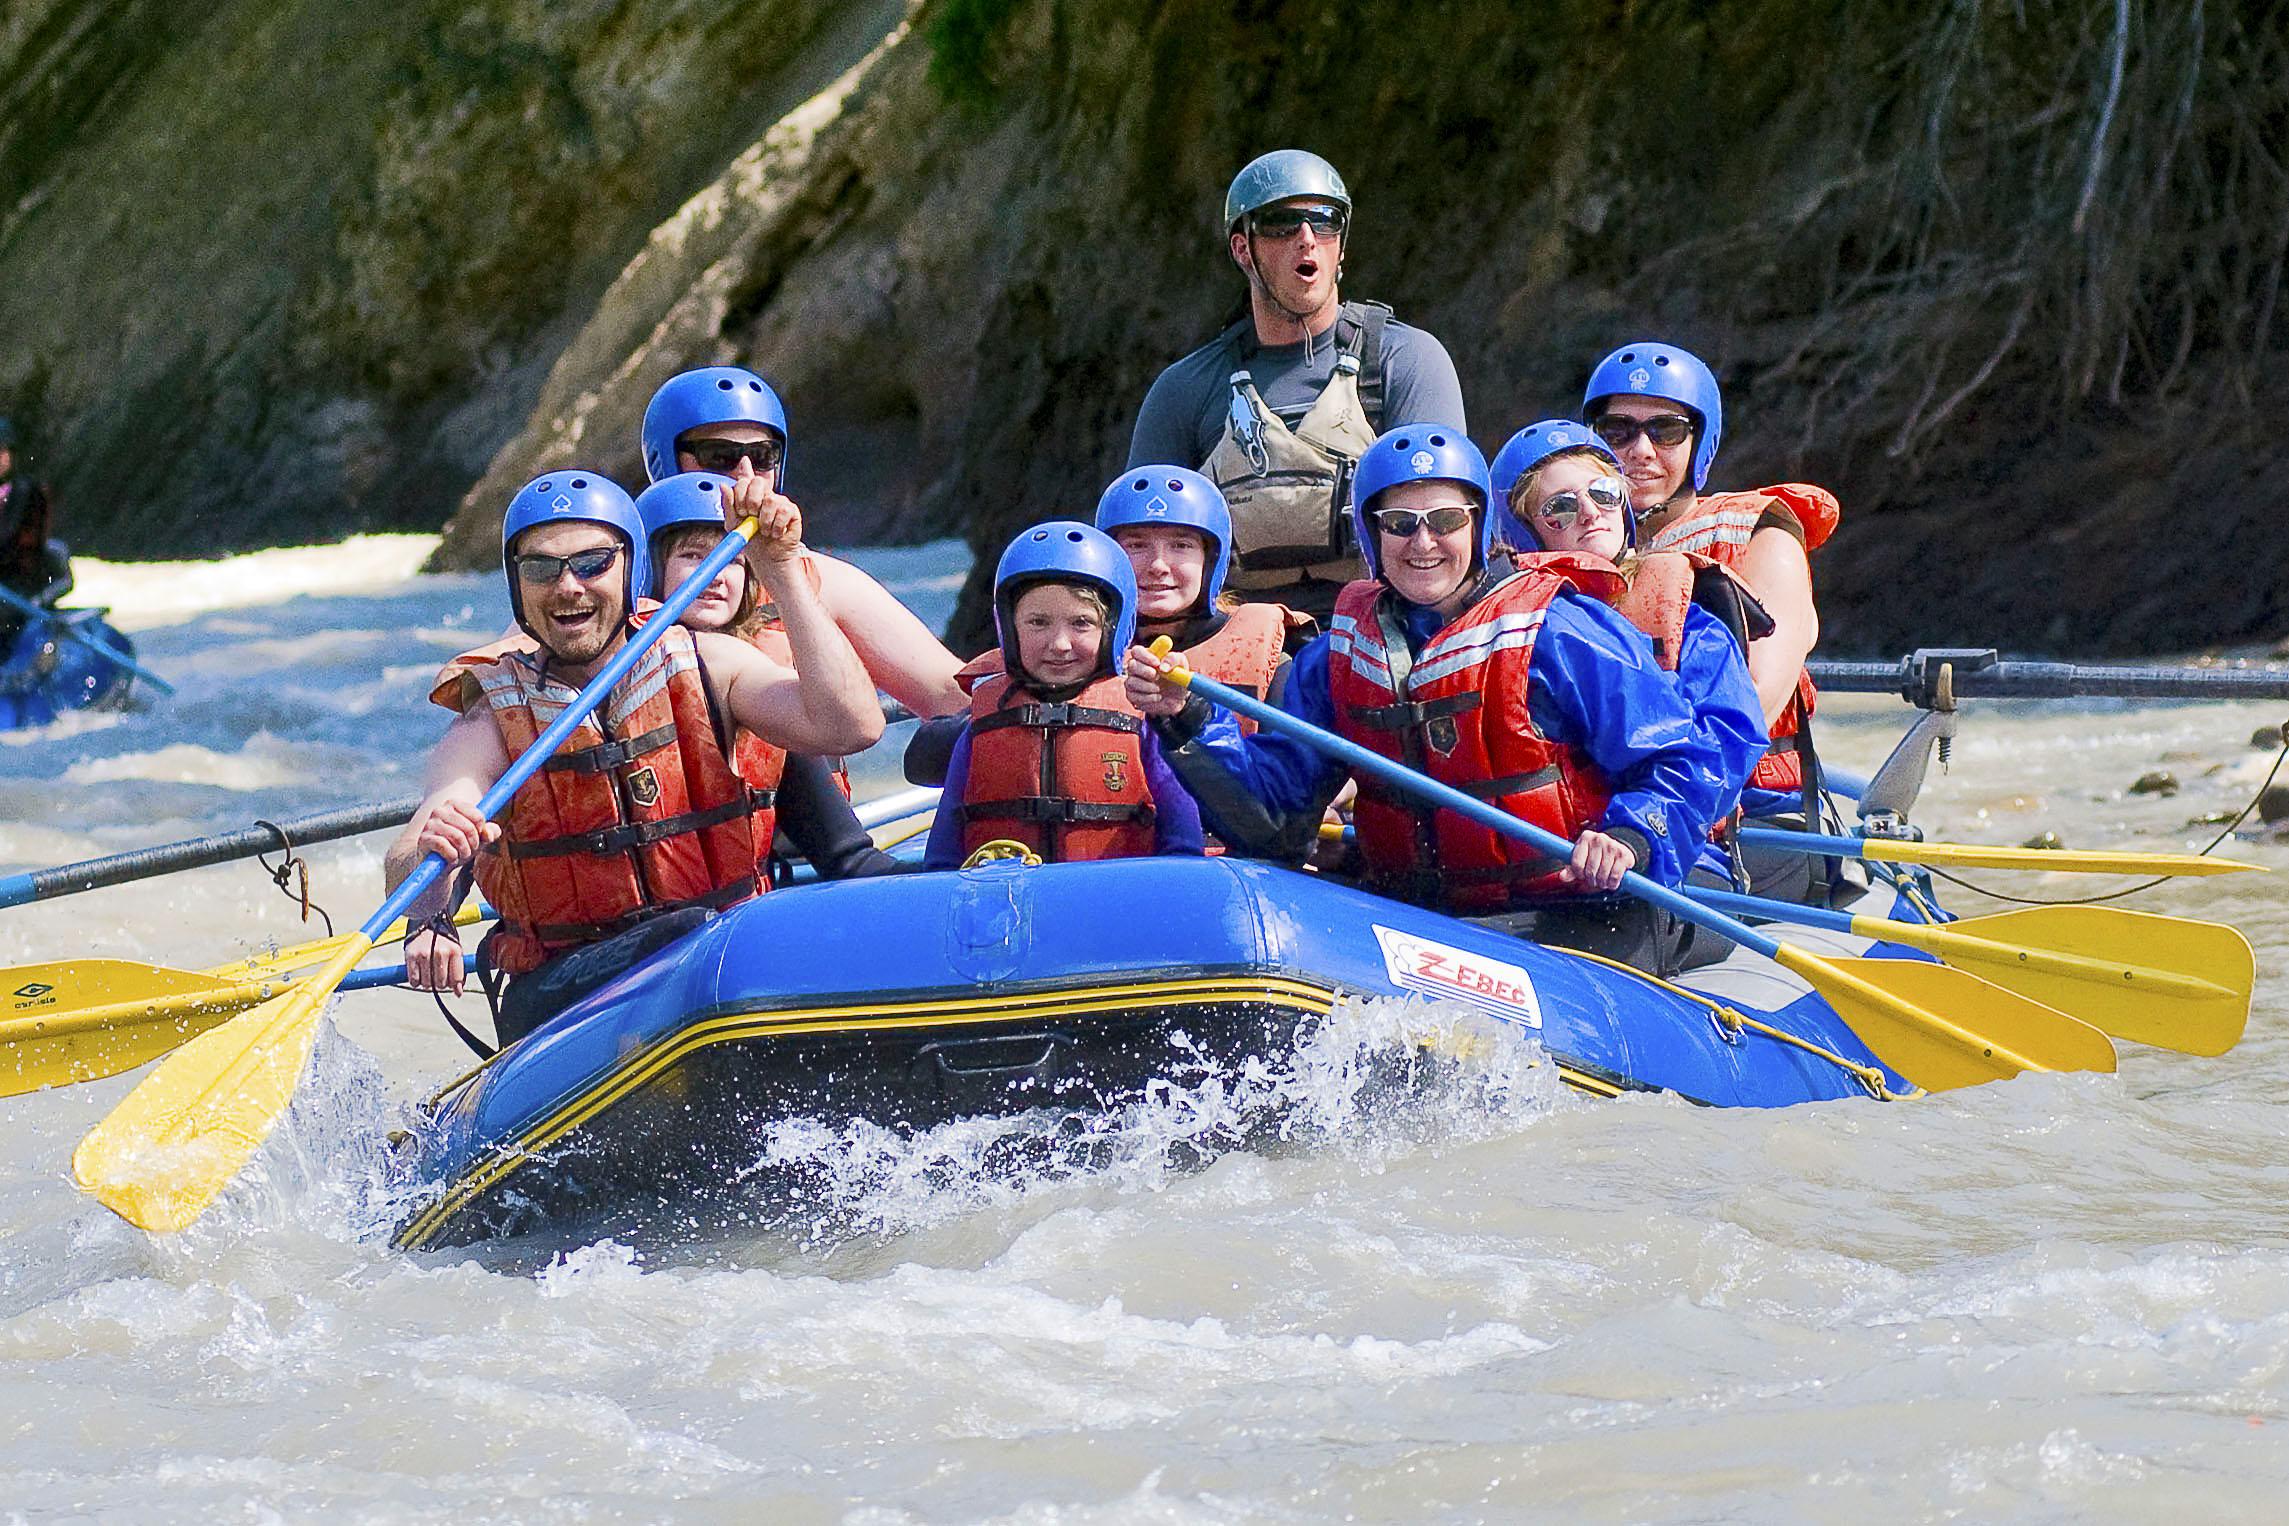 Raft moderate rapids on the twisty turvy sulphur river